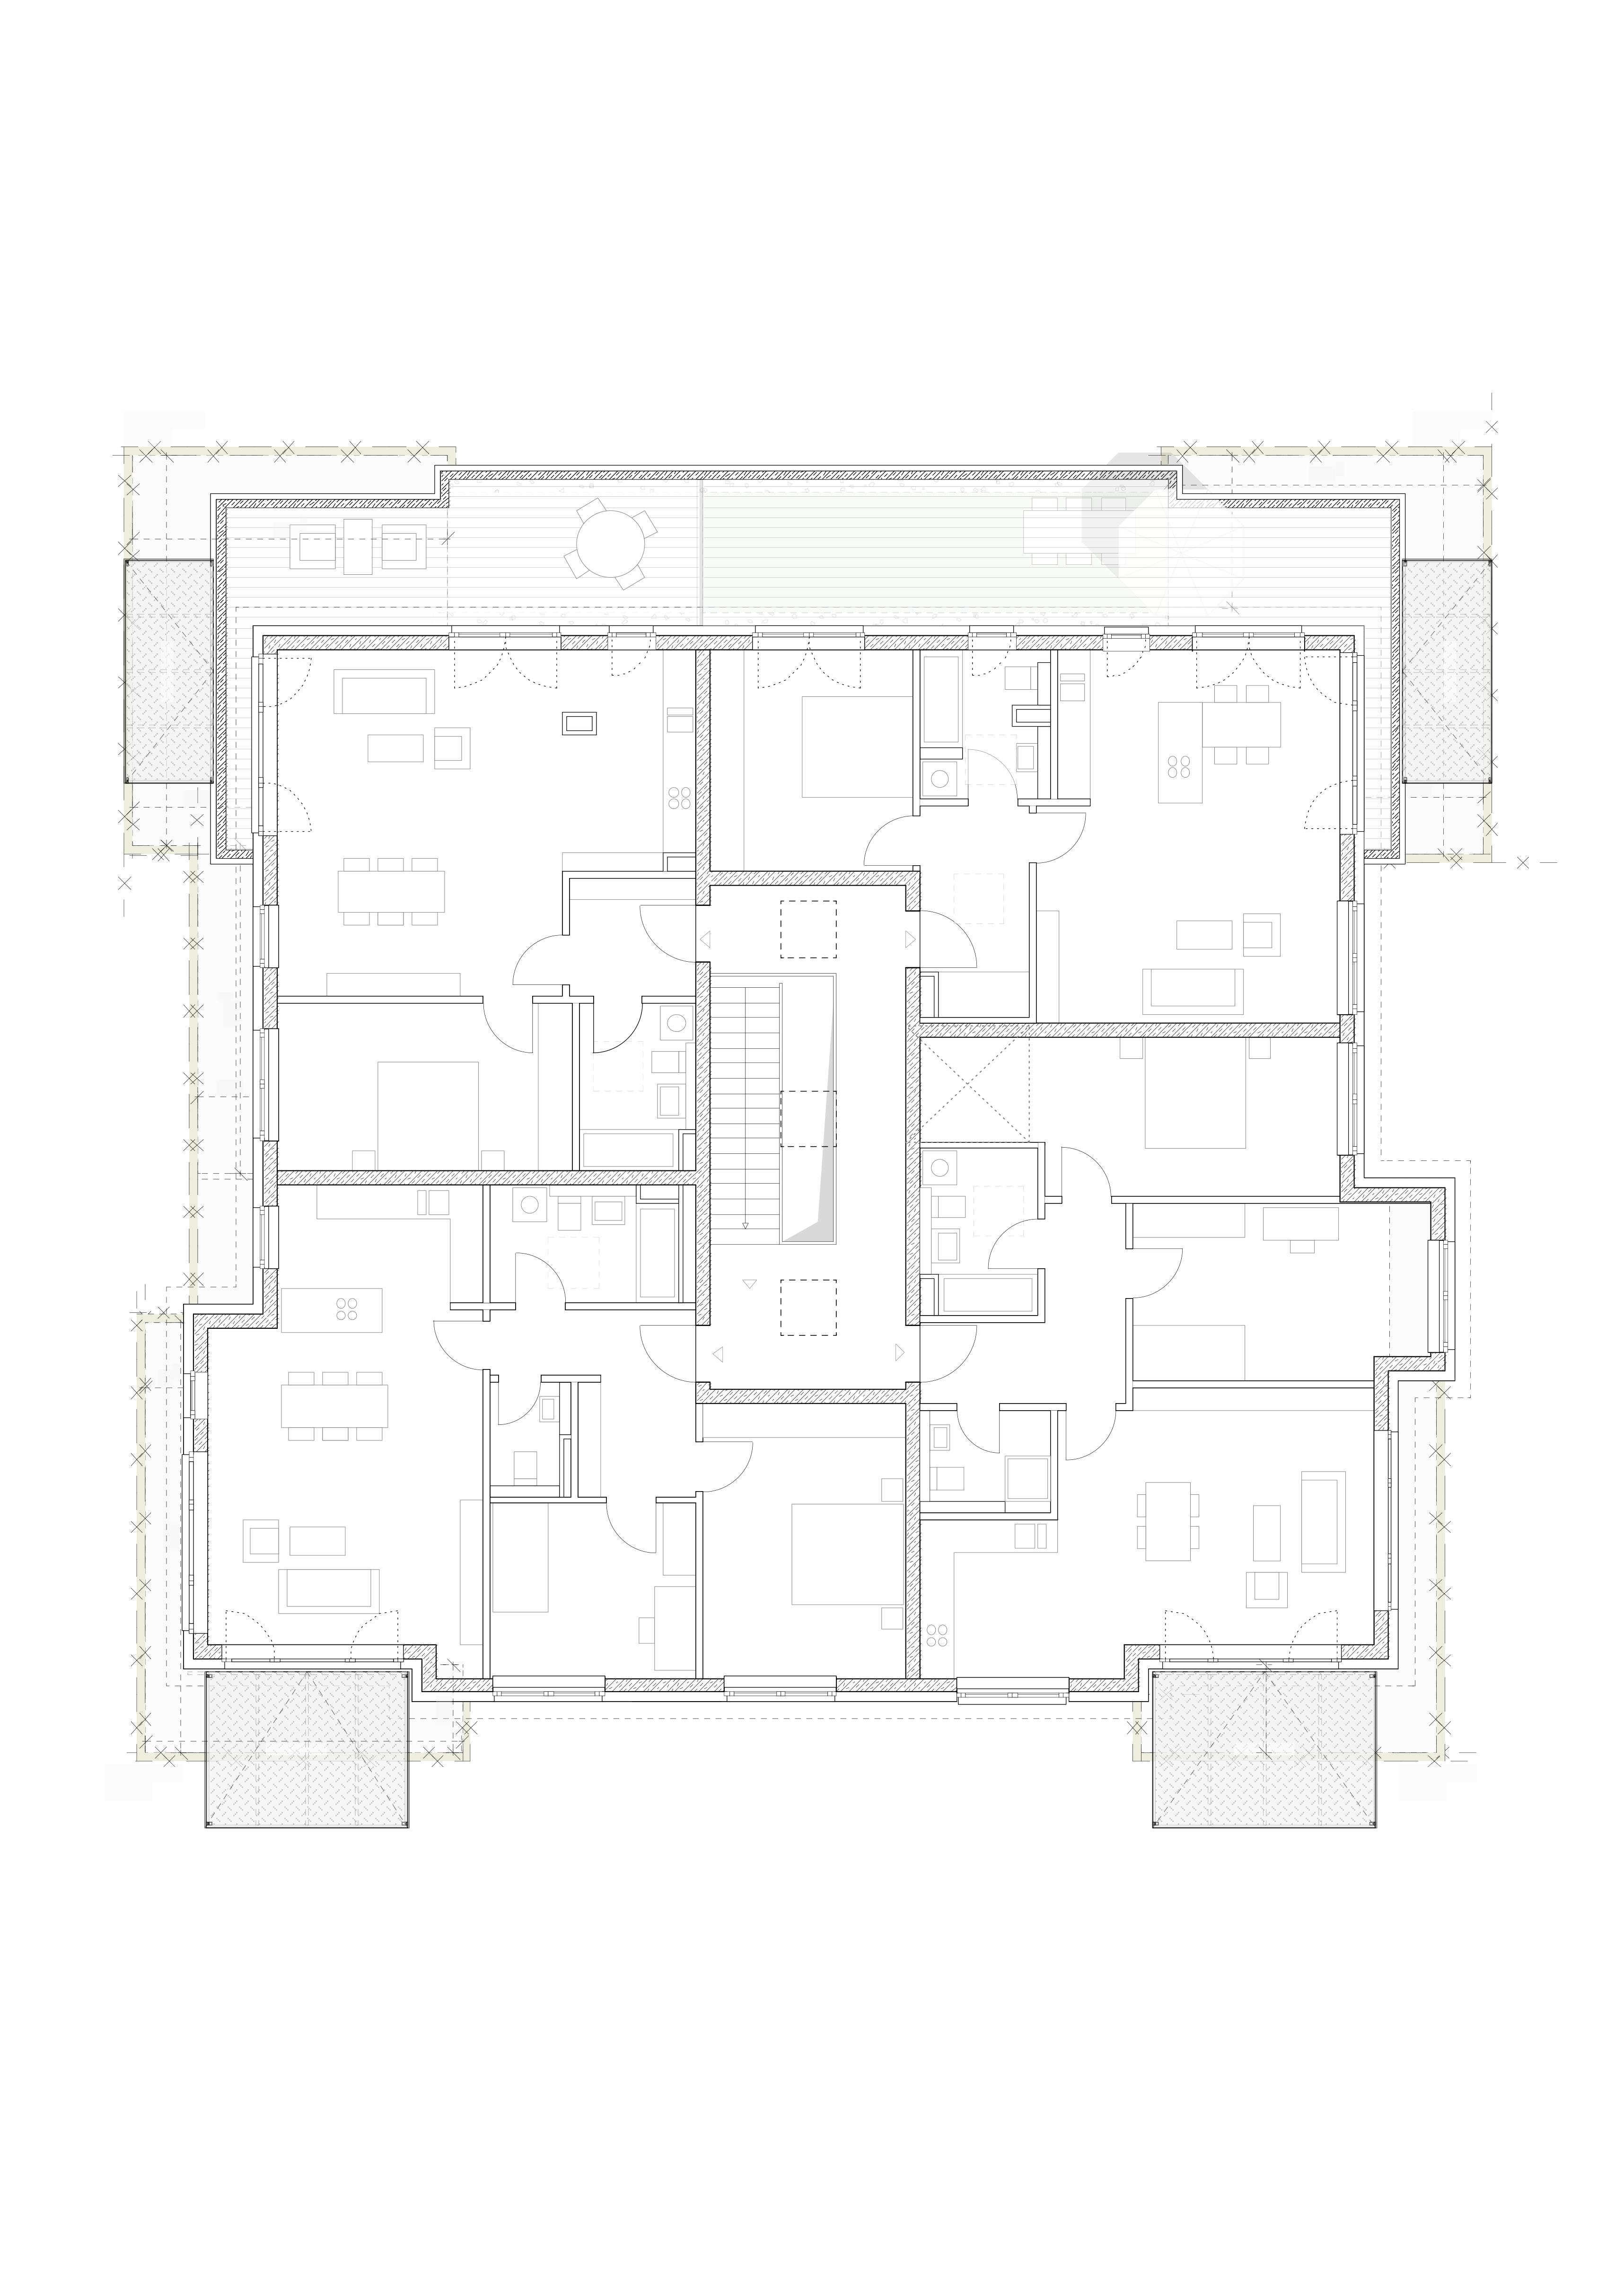 Haus 05 - Regelgeschoß